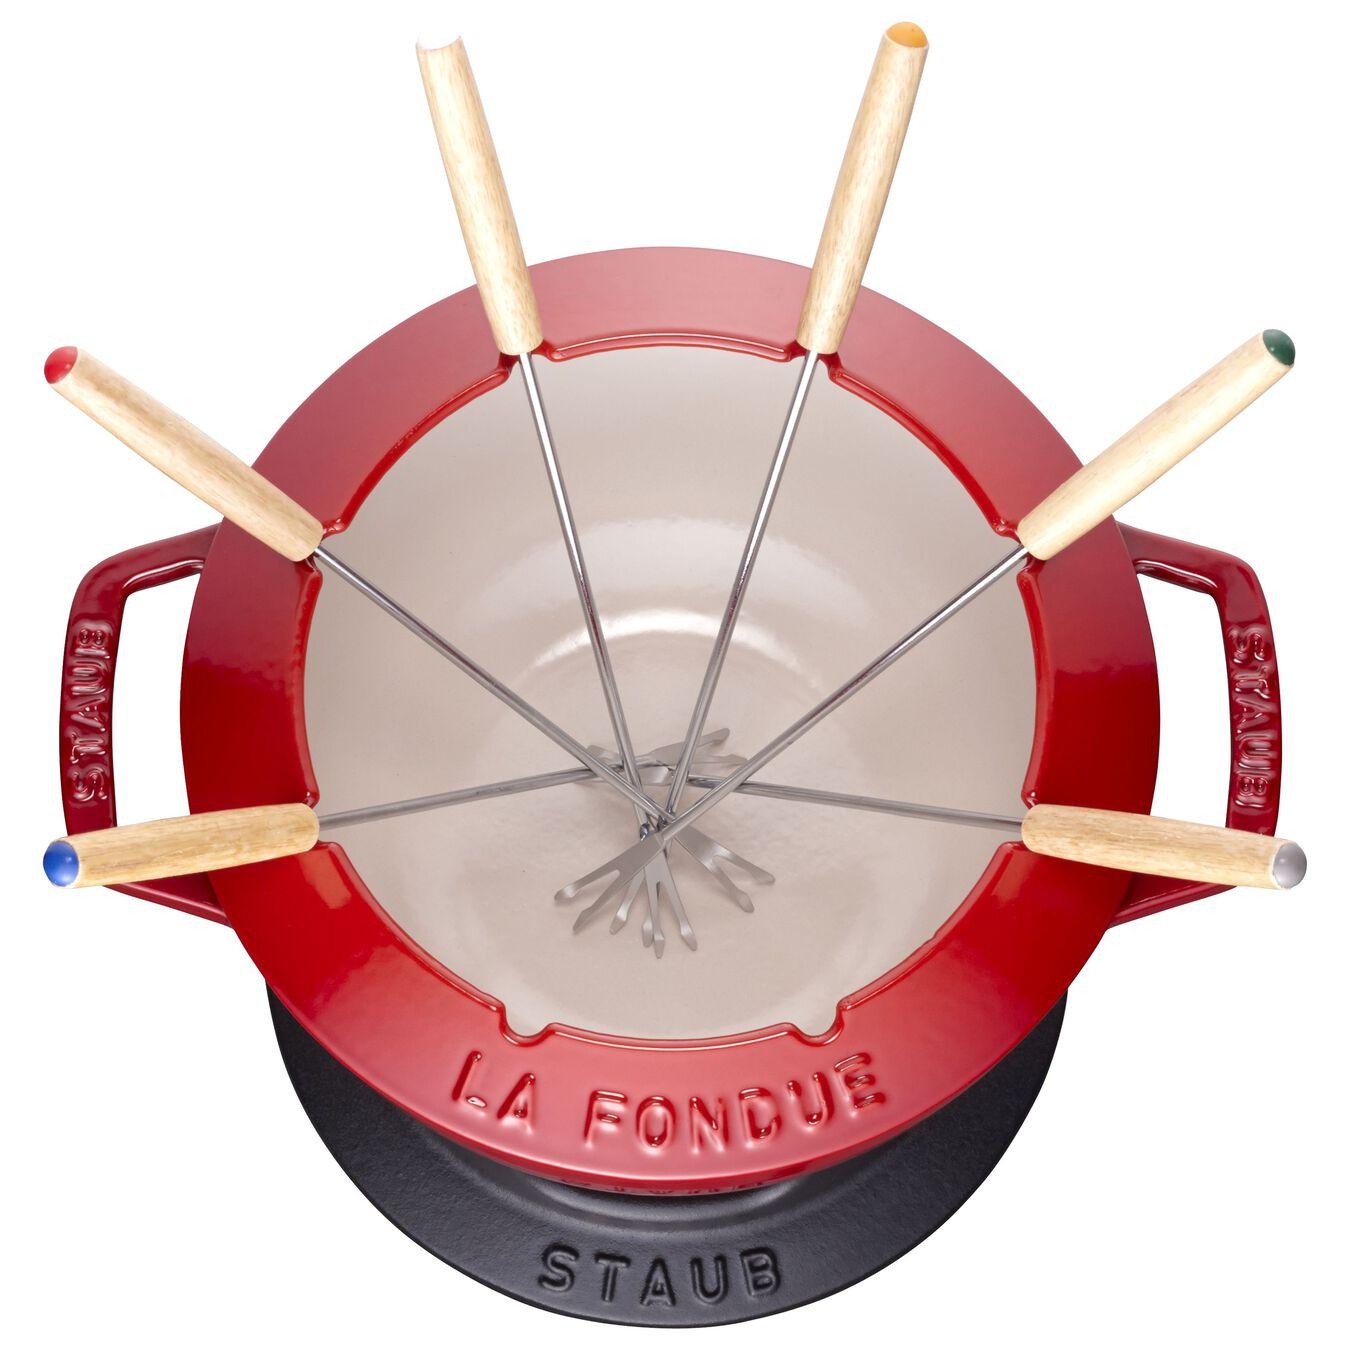 Service à fondue 18 cm, Cerise,,large 2